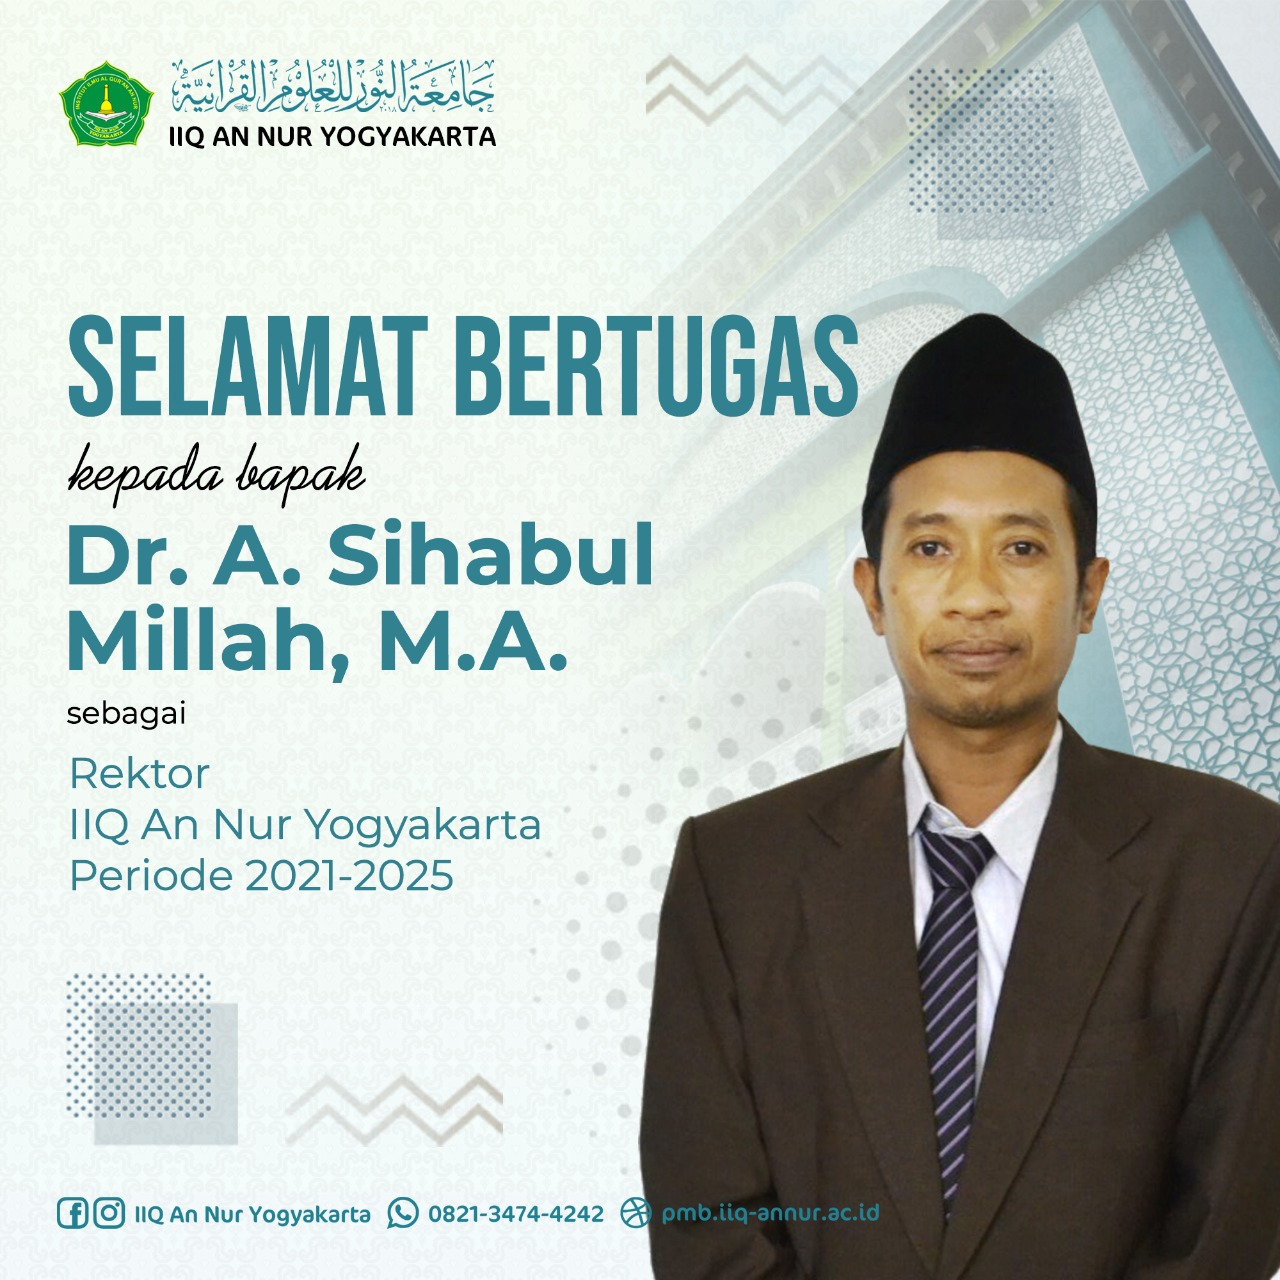 Rektor Terpilih IIQ An Nur 2021-2025 Dr. A Sihabul Millah, MA